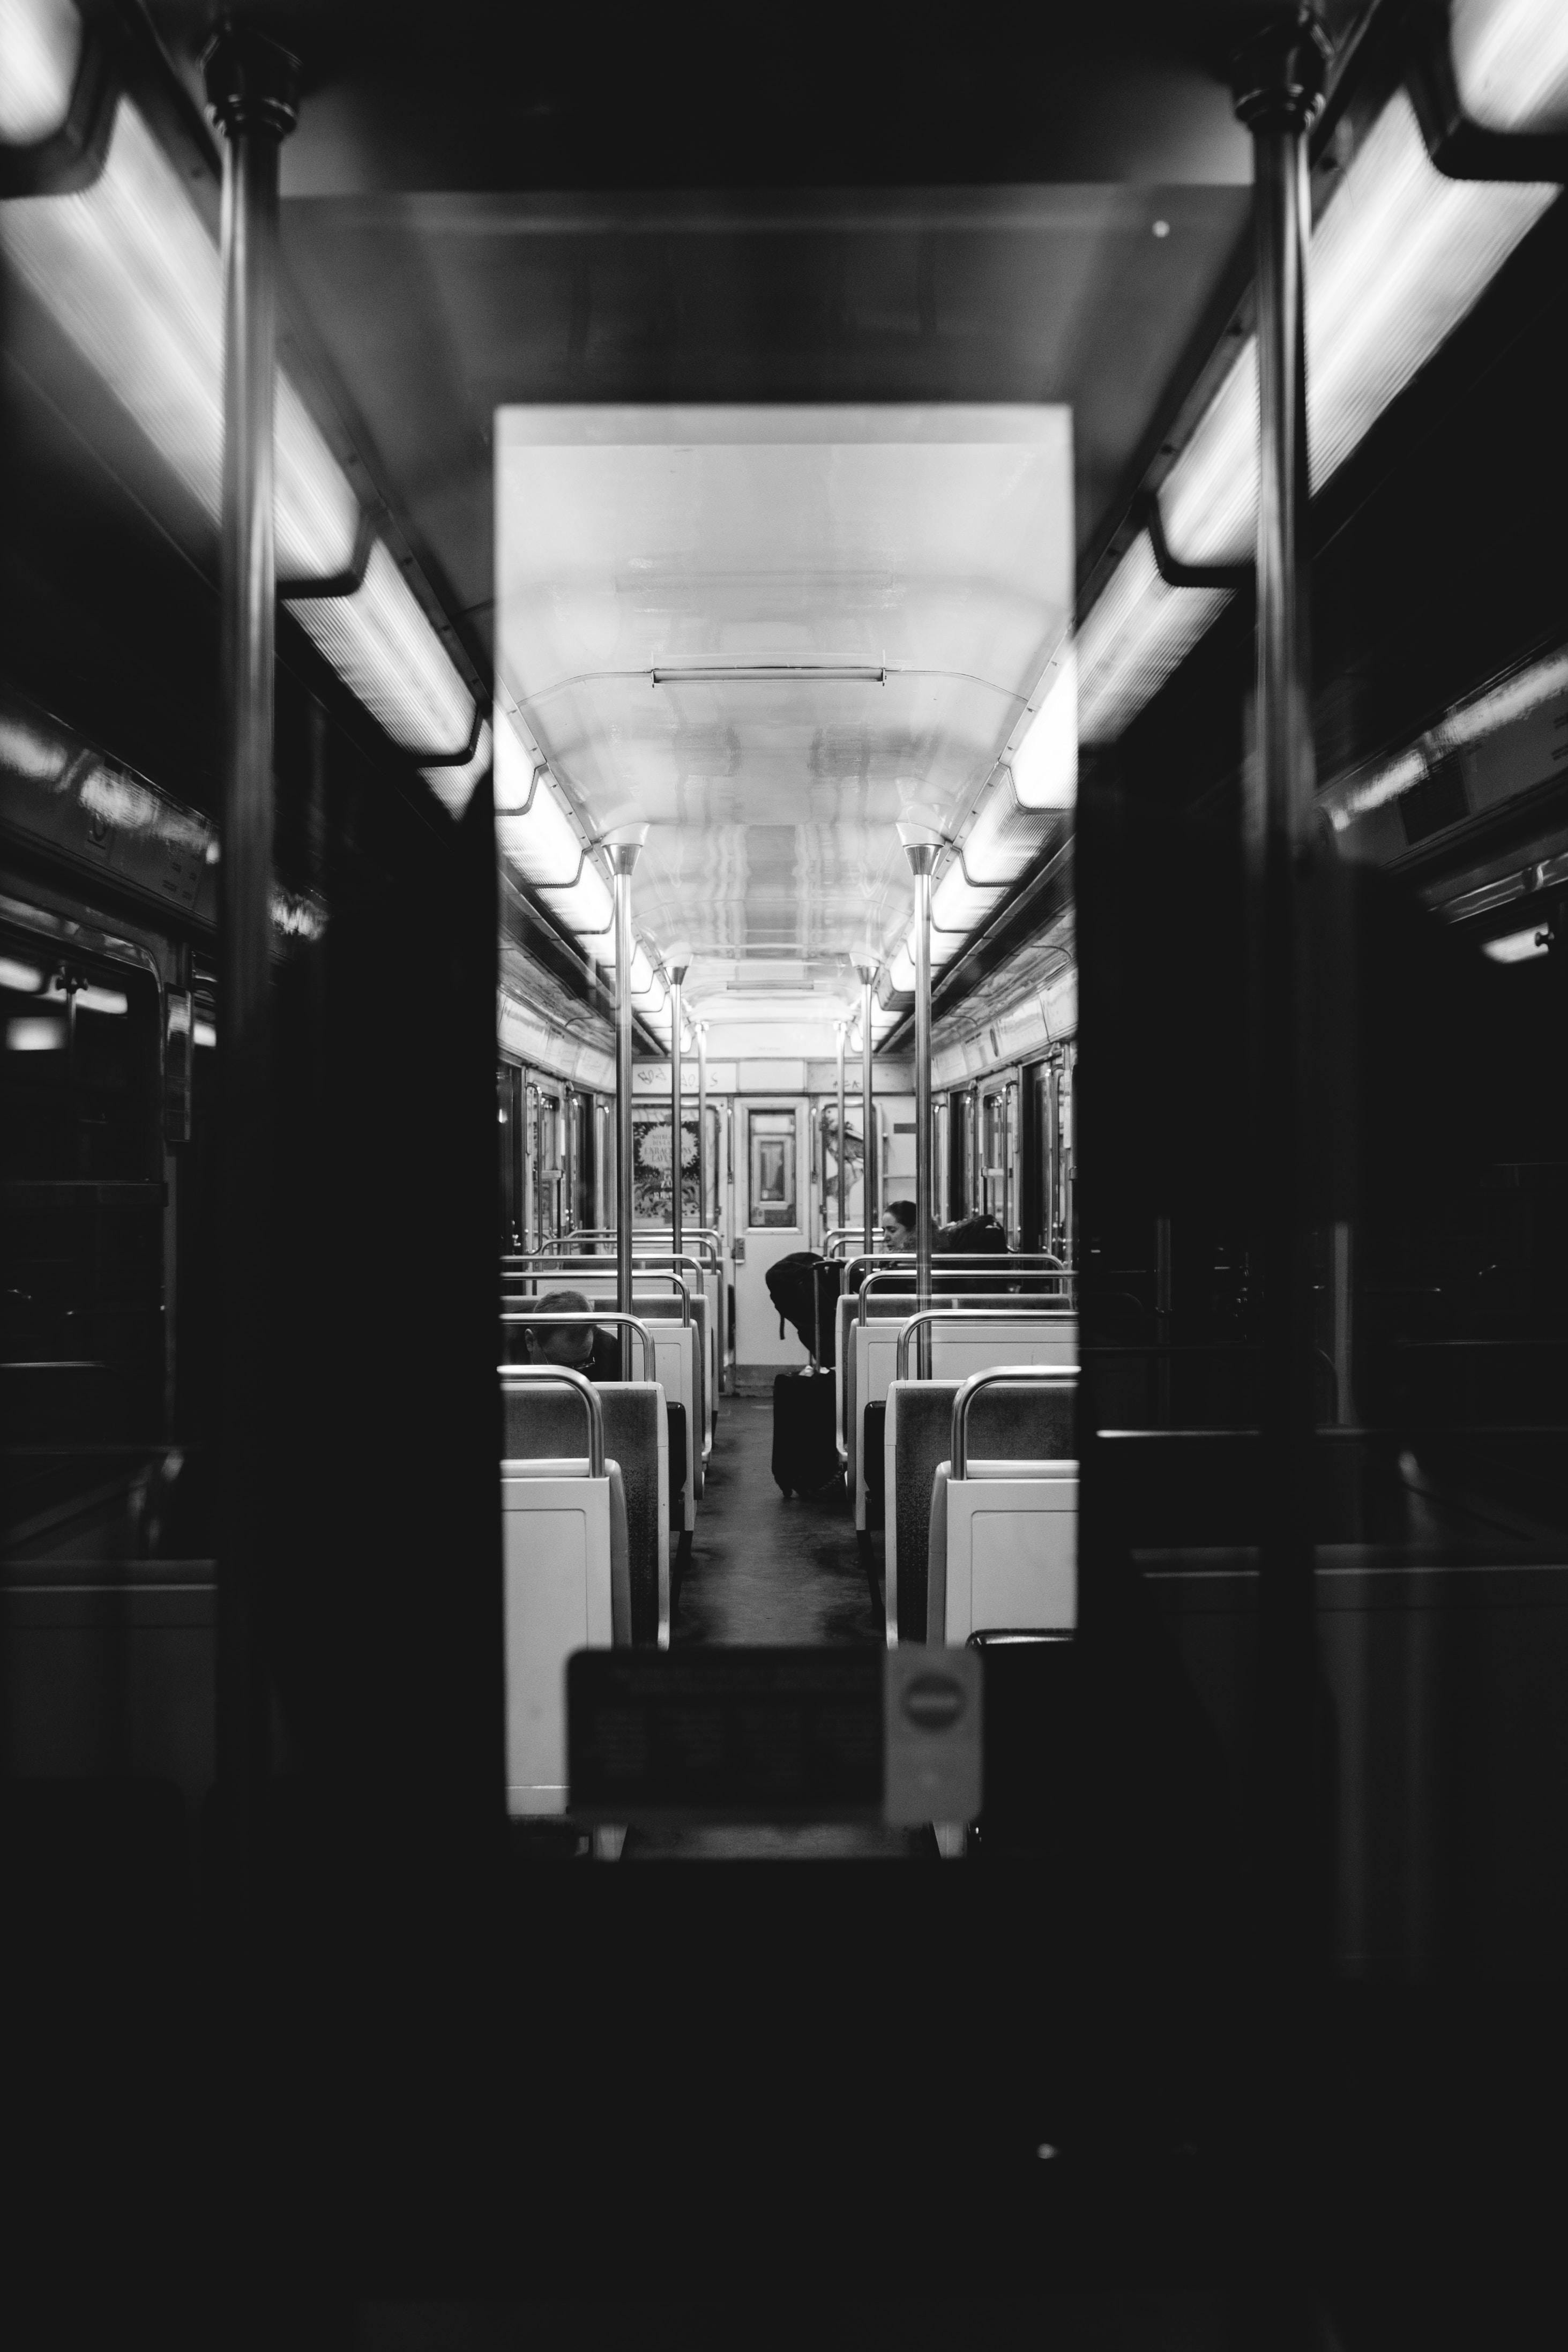 greyscale photo of train interior